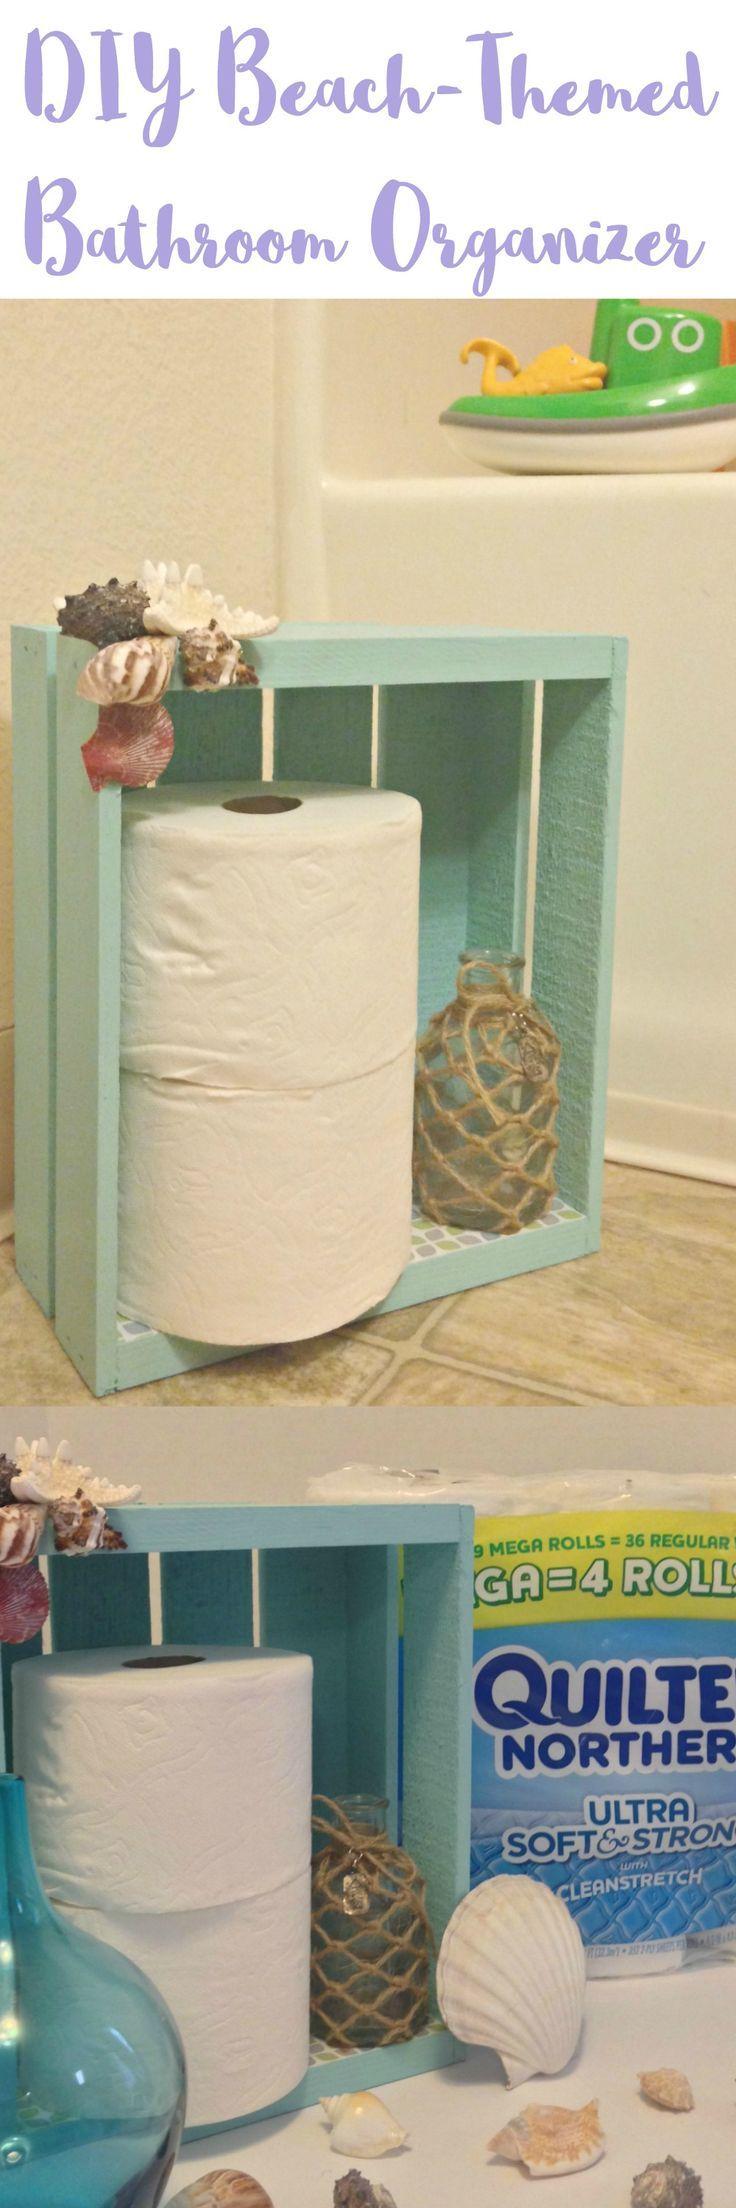 Diy bathroom organization - Diy Bathroom Organizer And Toilet Paper Holder